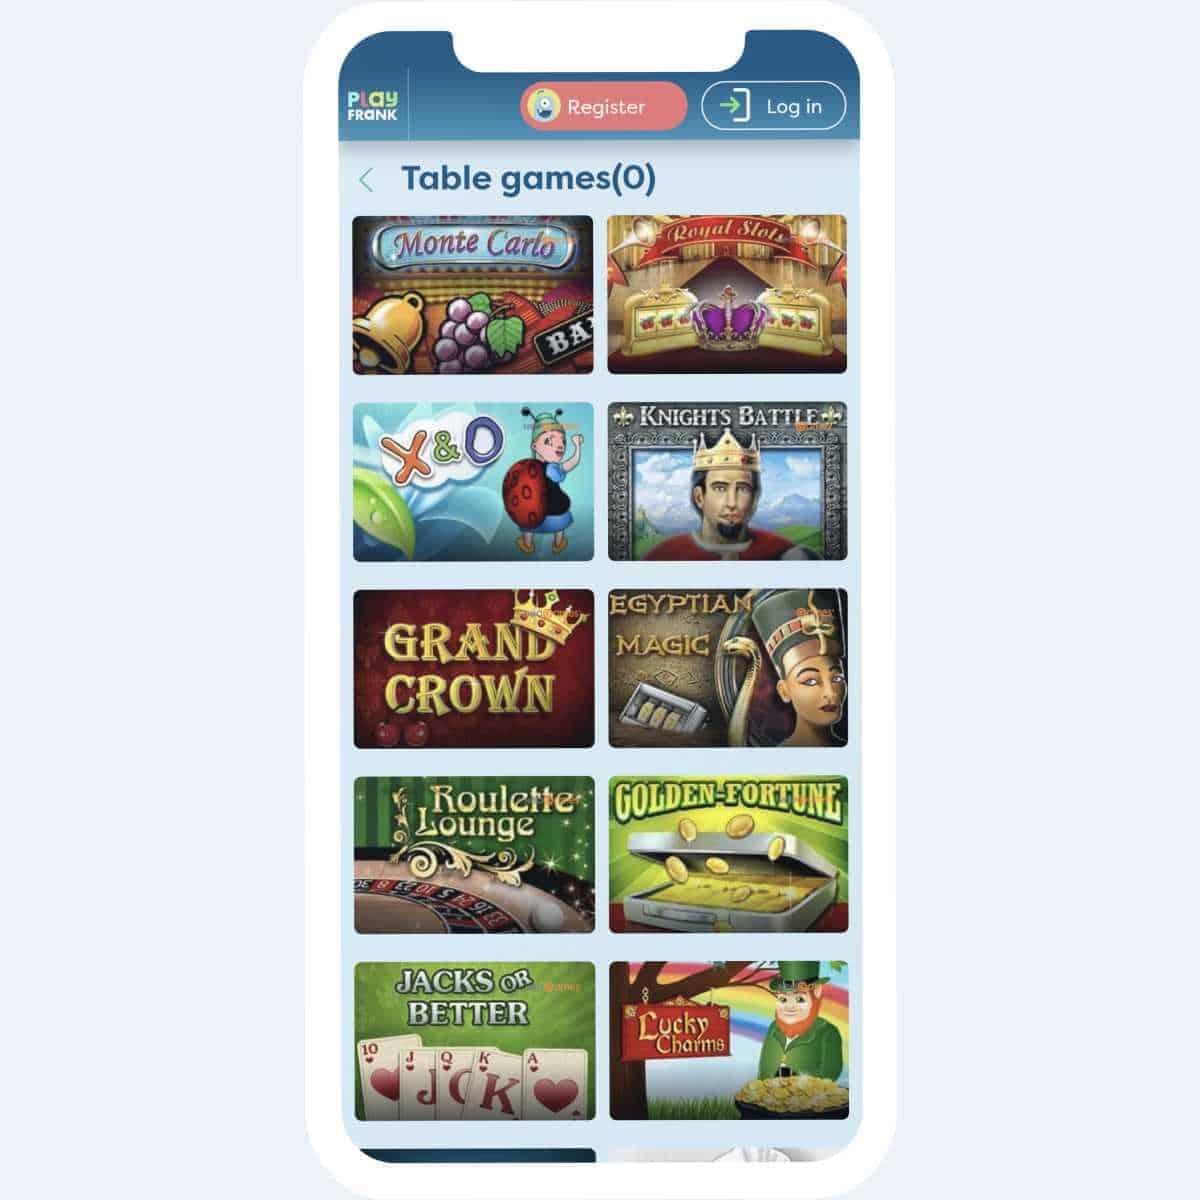 PlayFrank live casino mobile